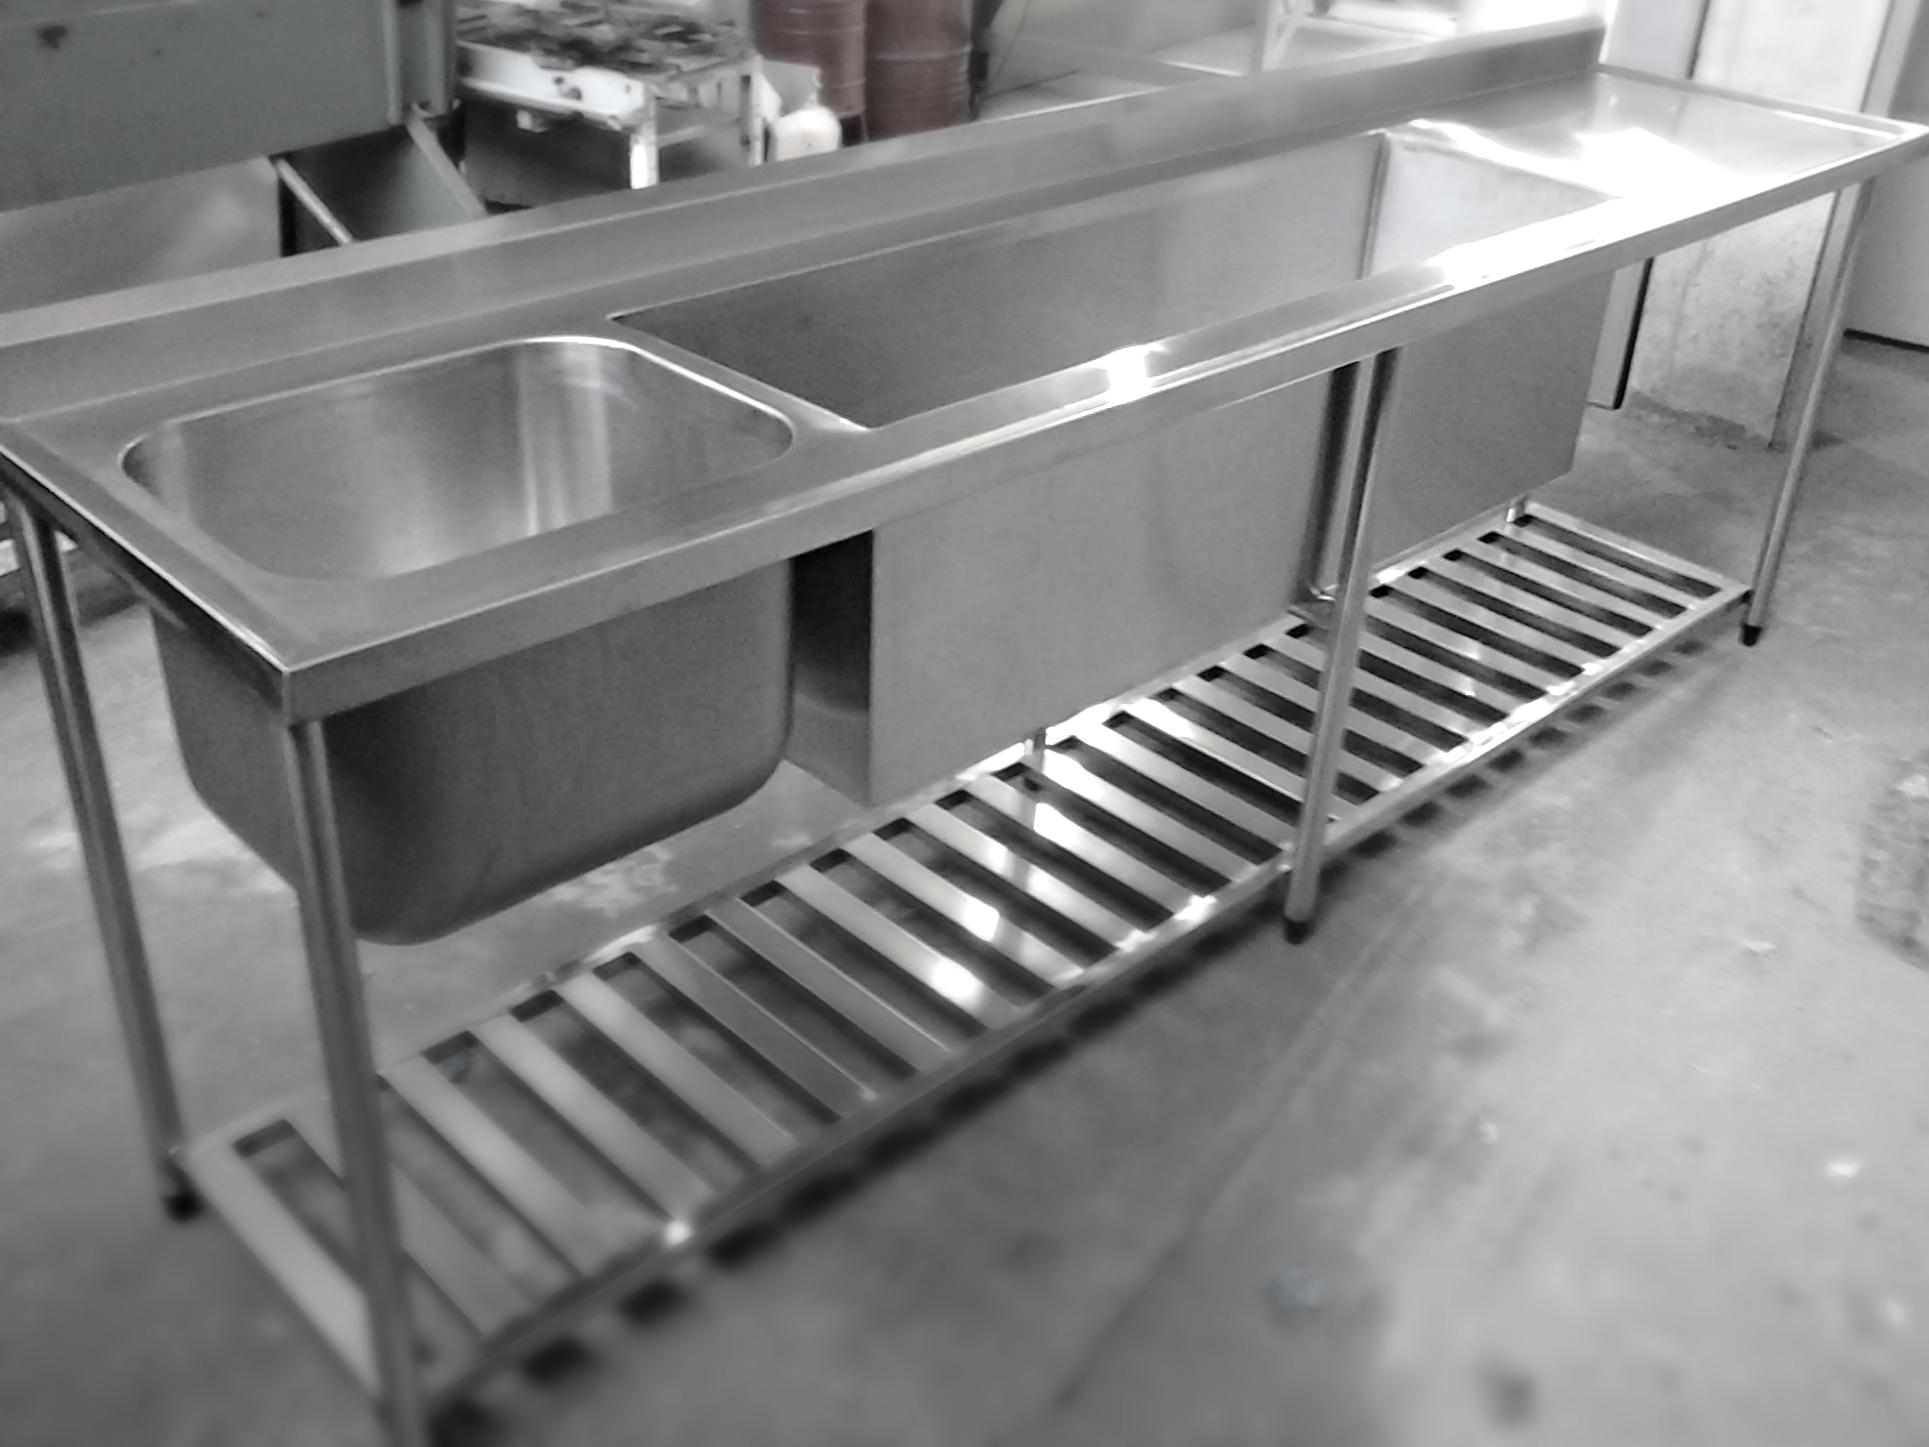 Cozinha Industrial Equipamentos Em Inox Resteel